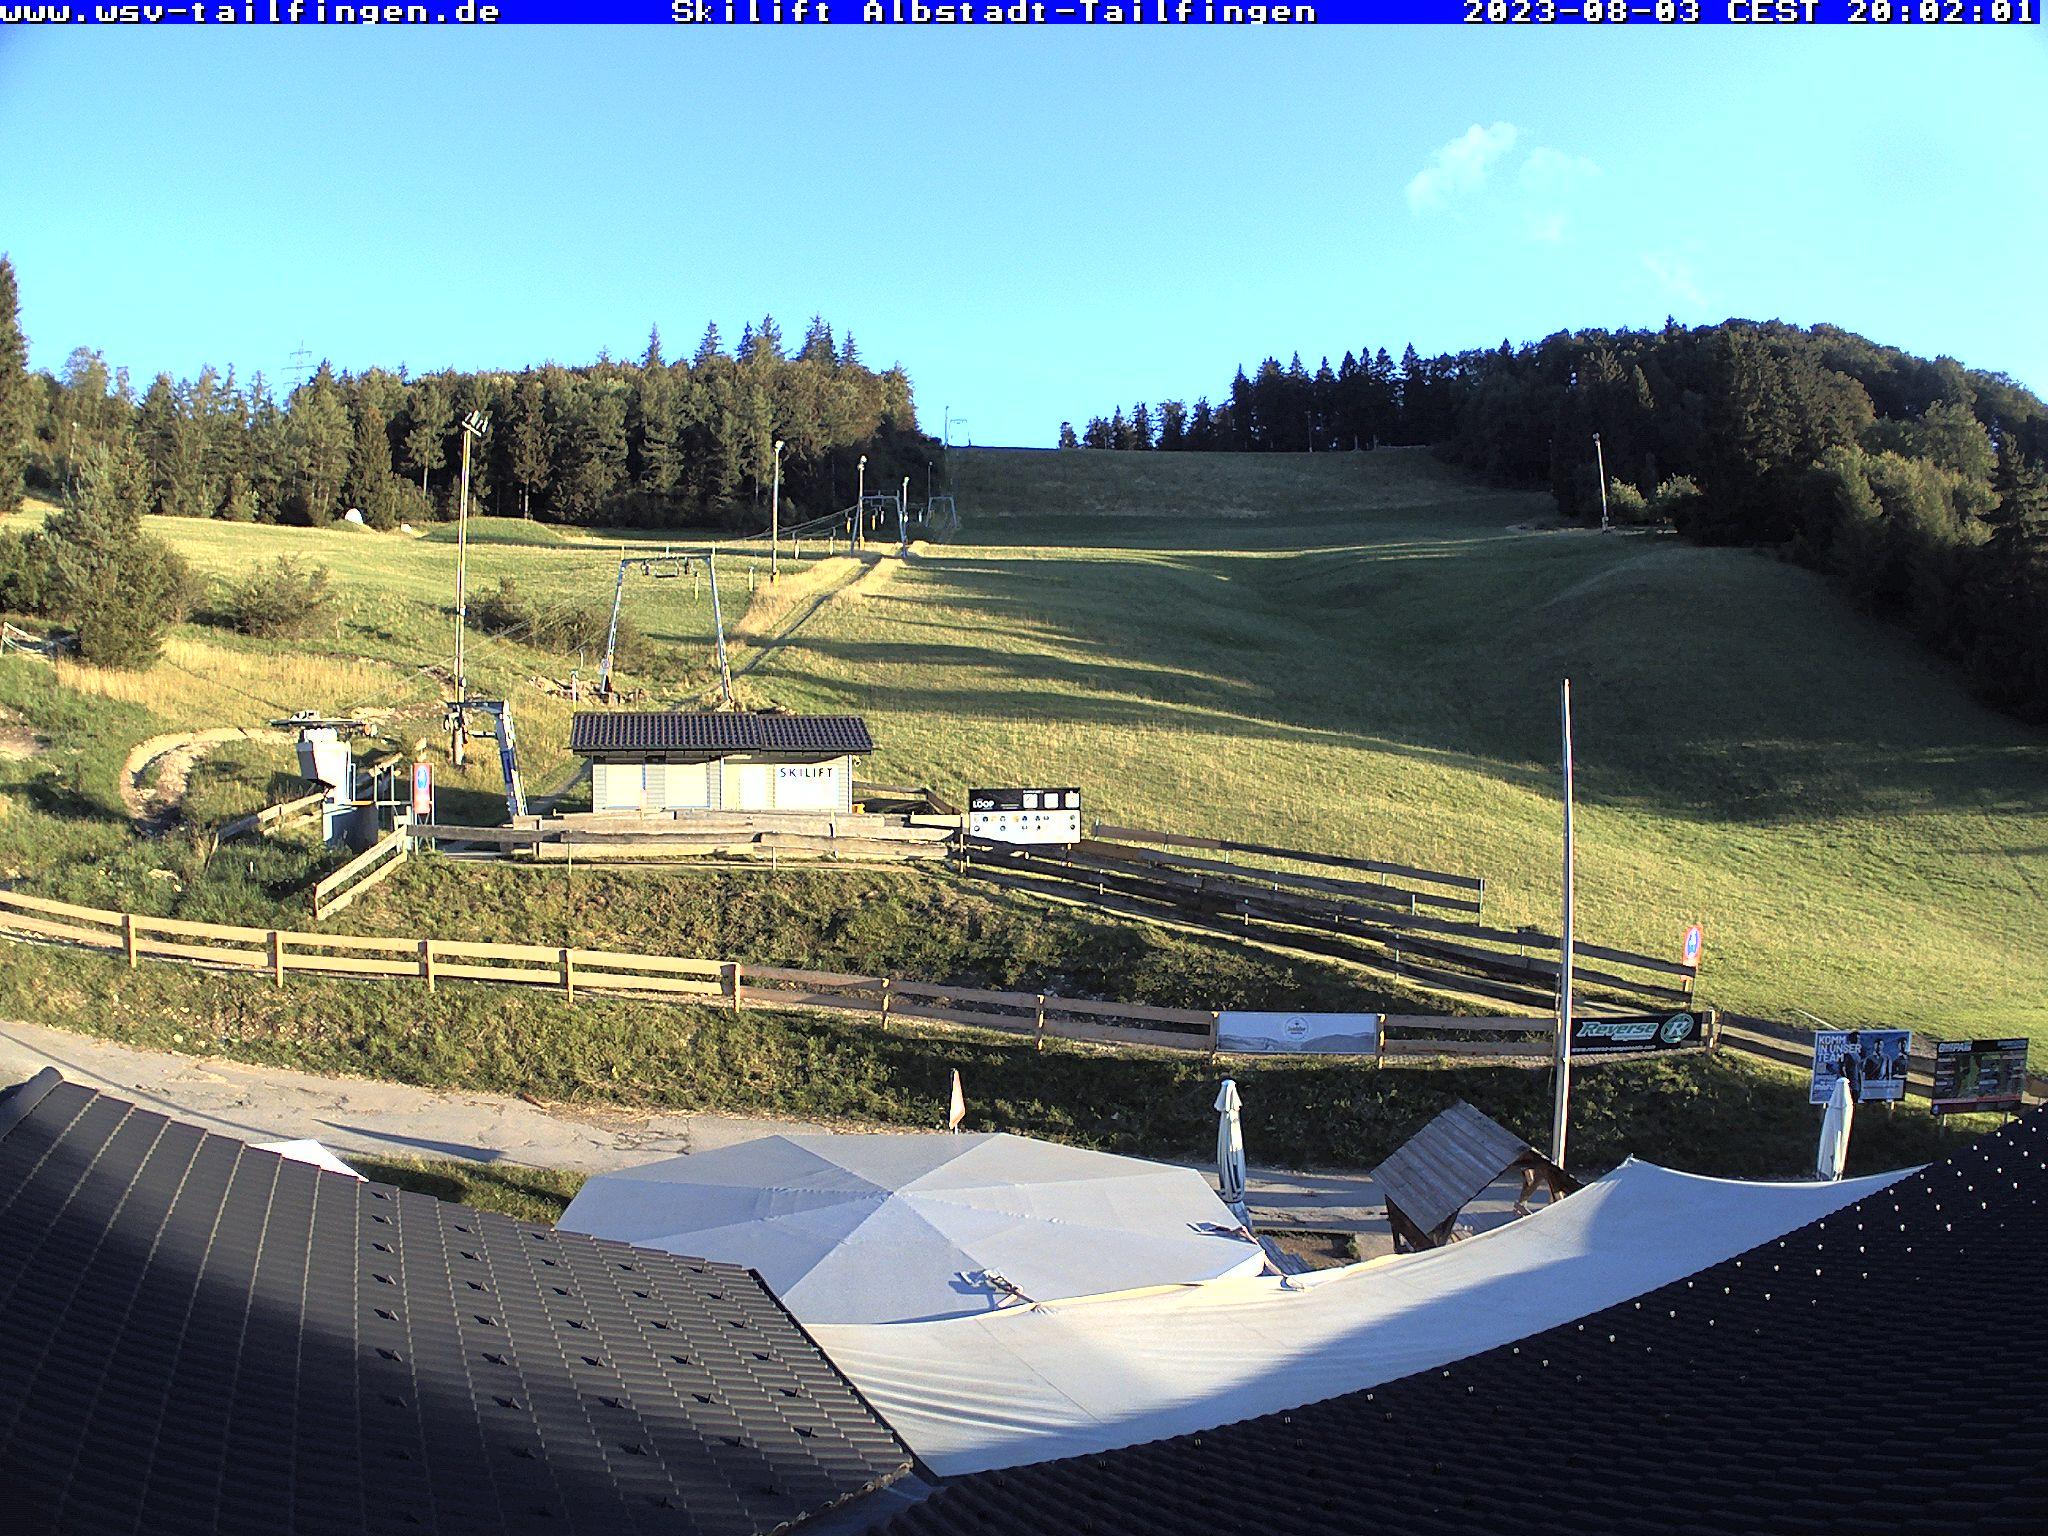 Albstadt-Tailfingen Skilift and Bikepark